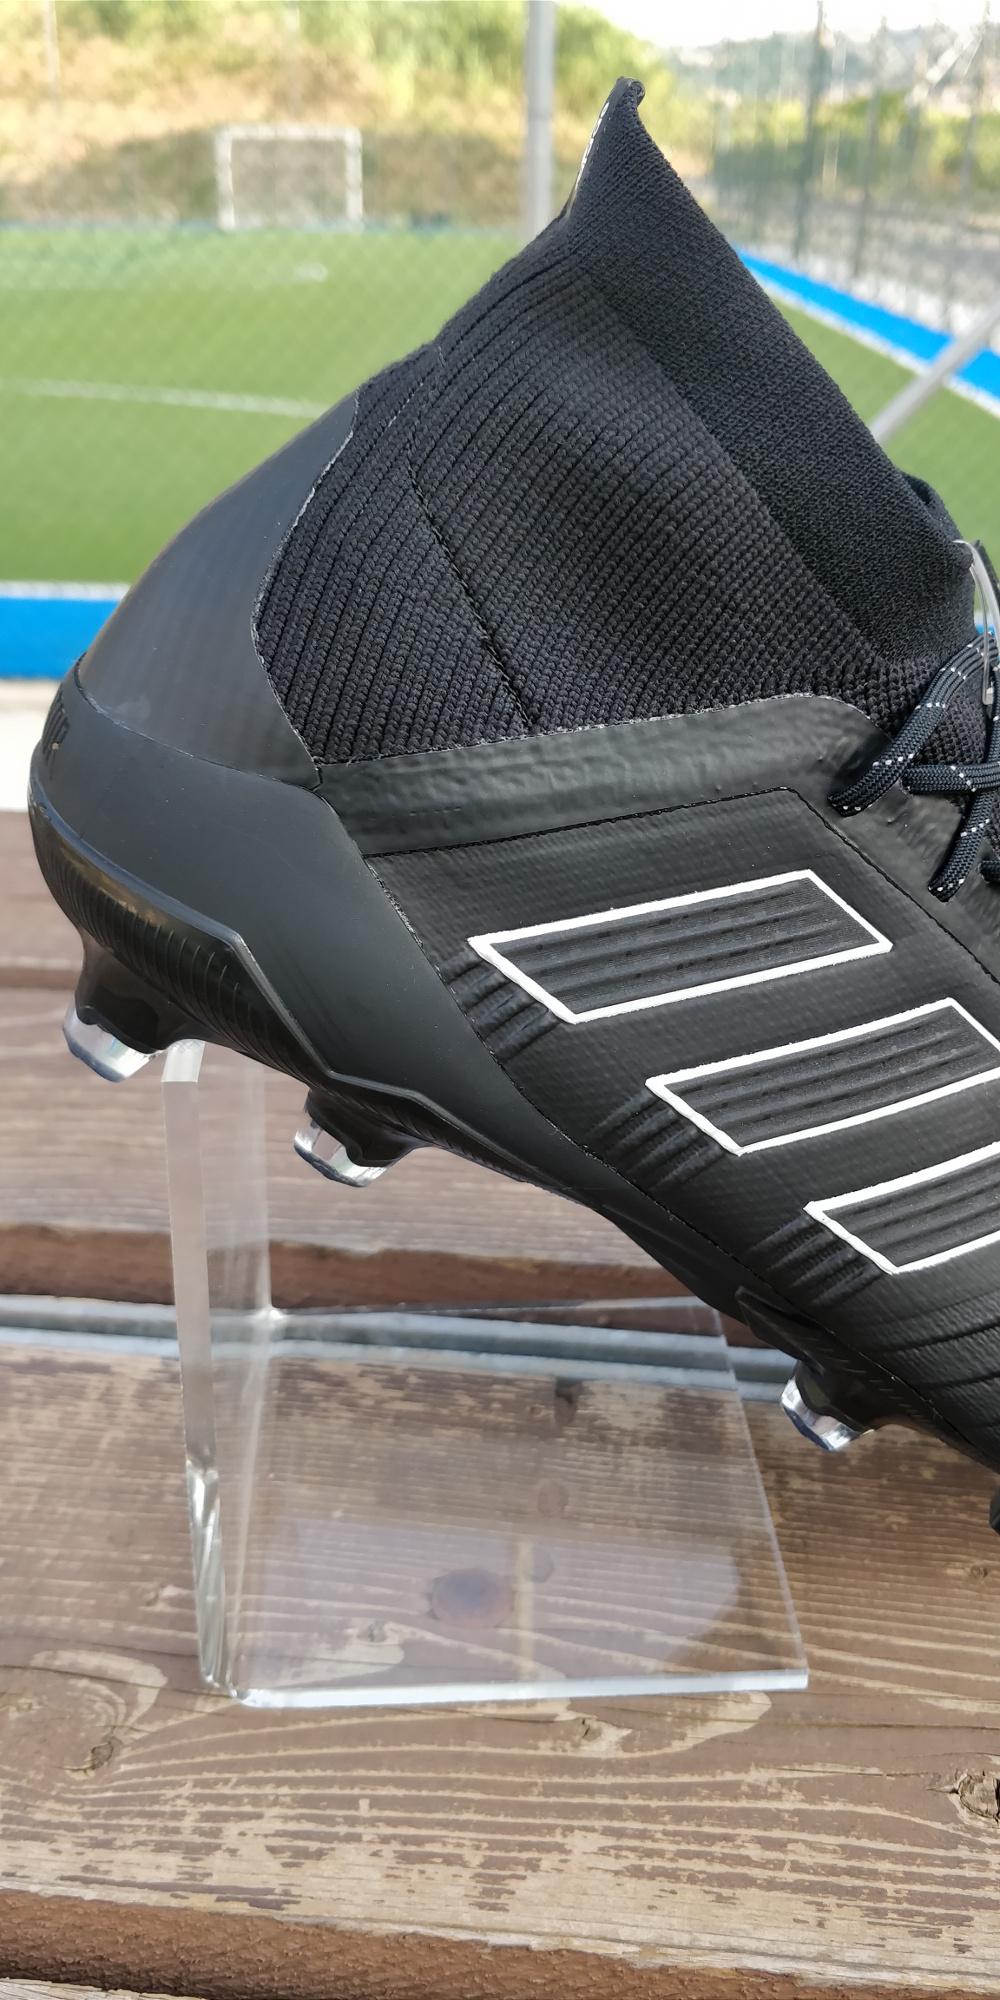 sports shoes d4f38 a6f0d Football shoes Adidas Scarpe Calcio Predator 18.1 FG Top di gamma Uomo 2018  4 4 di 9 ...